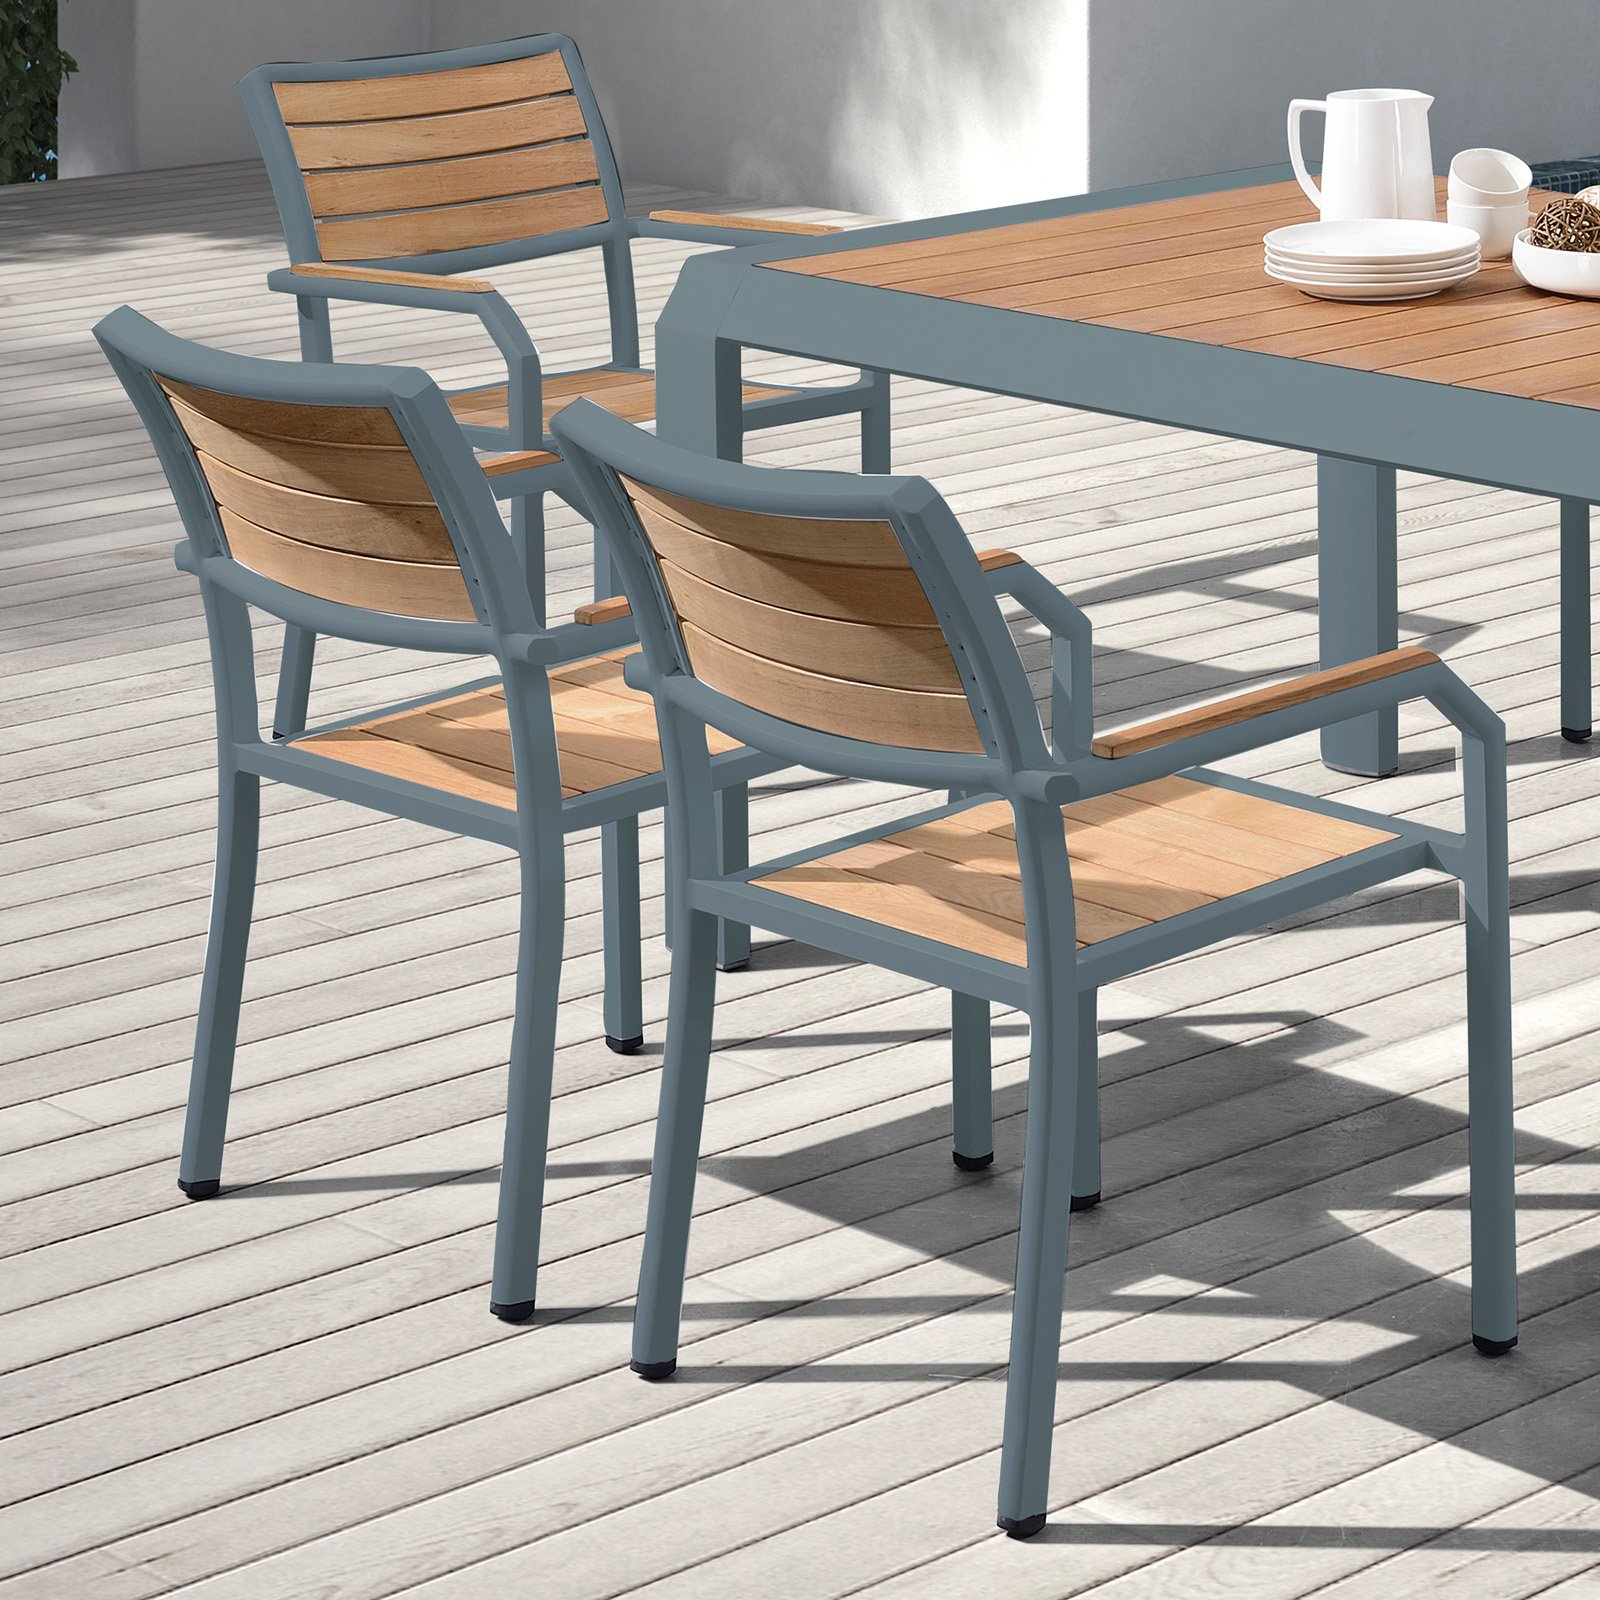 Armen Living Minsk Aluminum Teak Patio Dining Chair Set of 2 by Armen Living